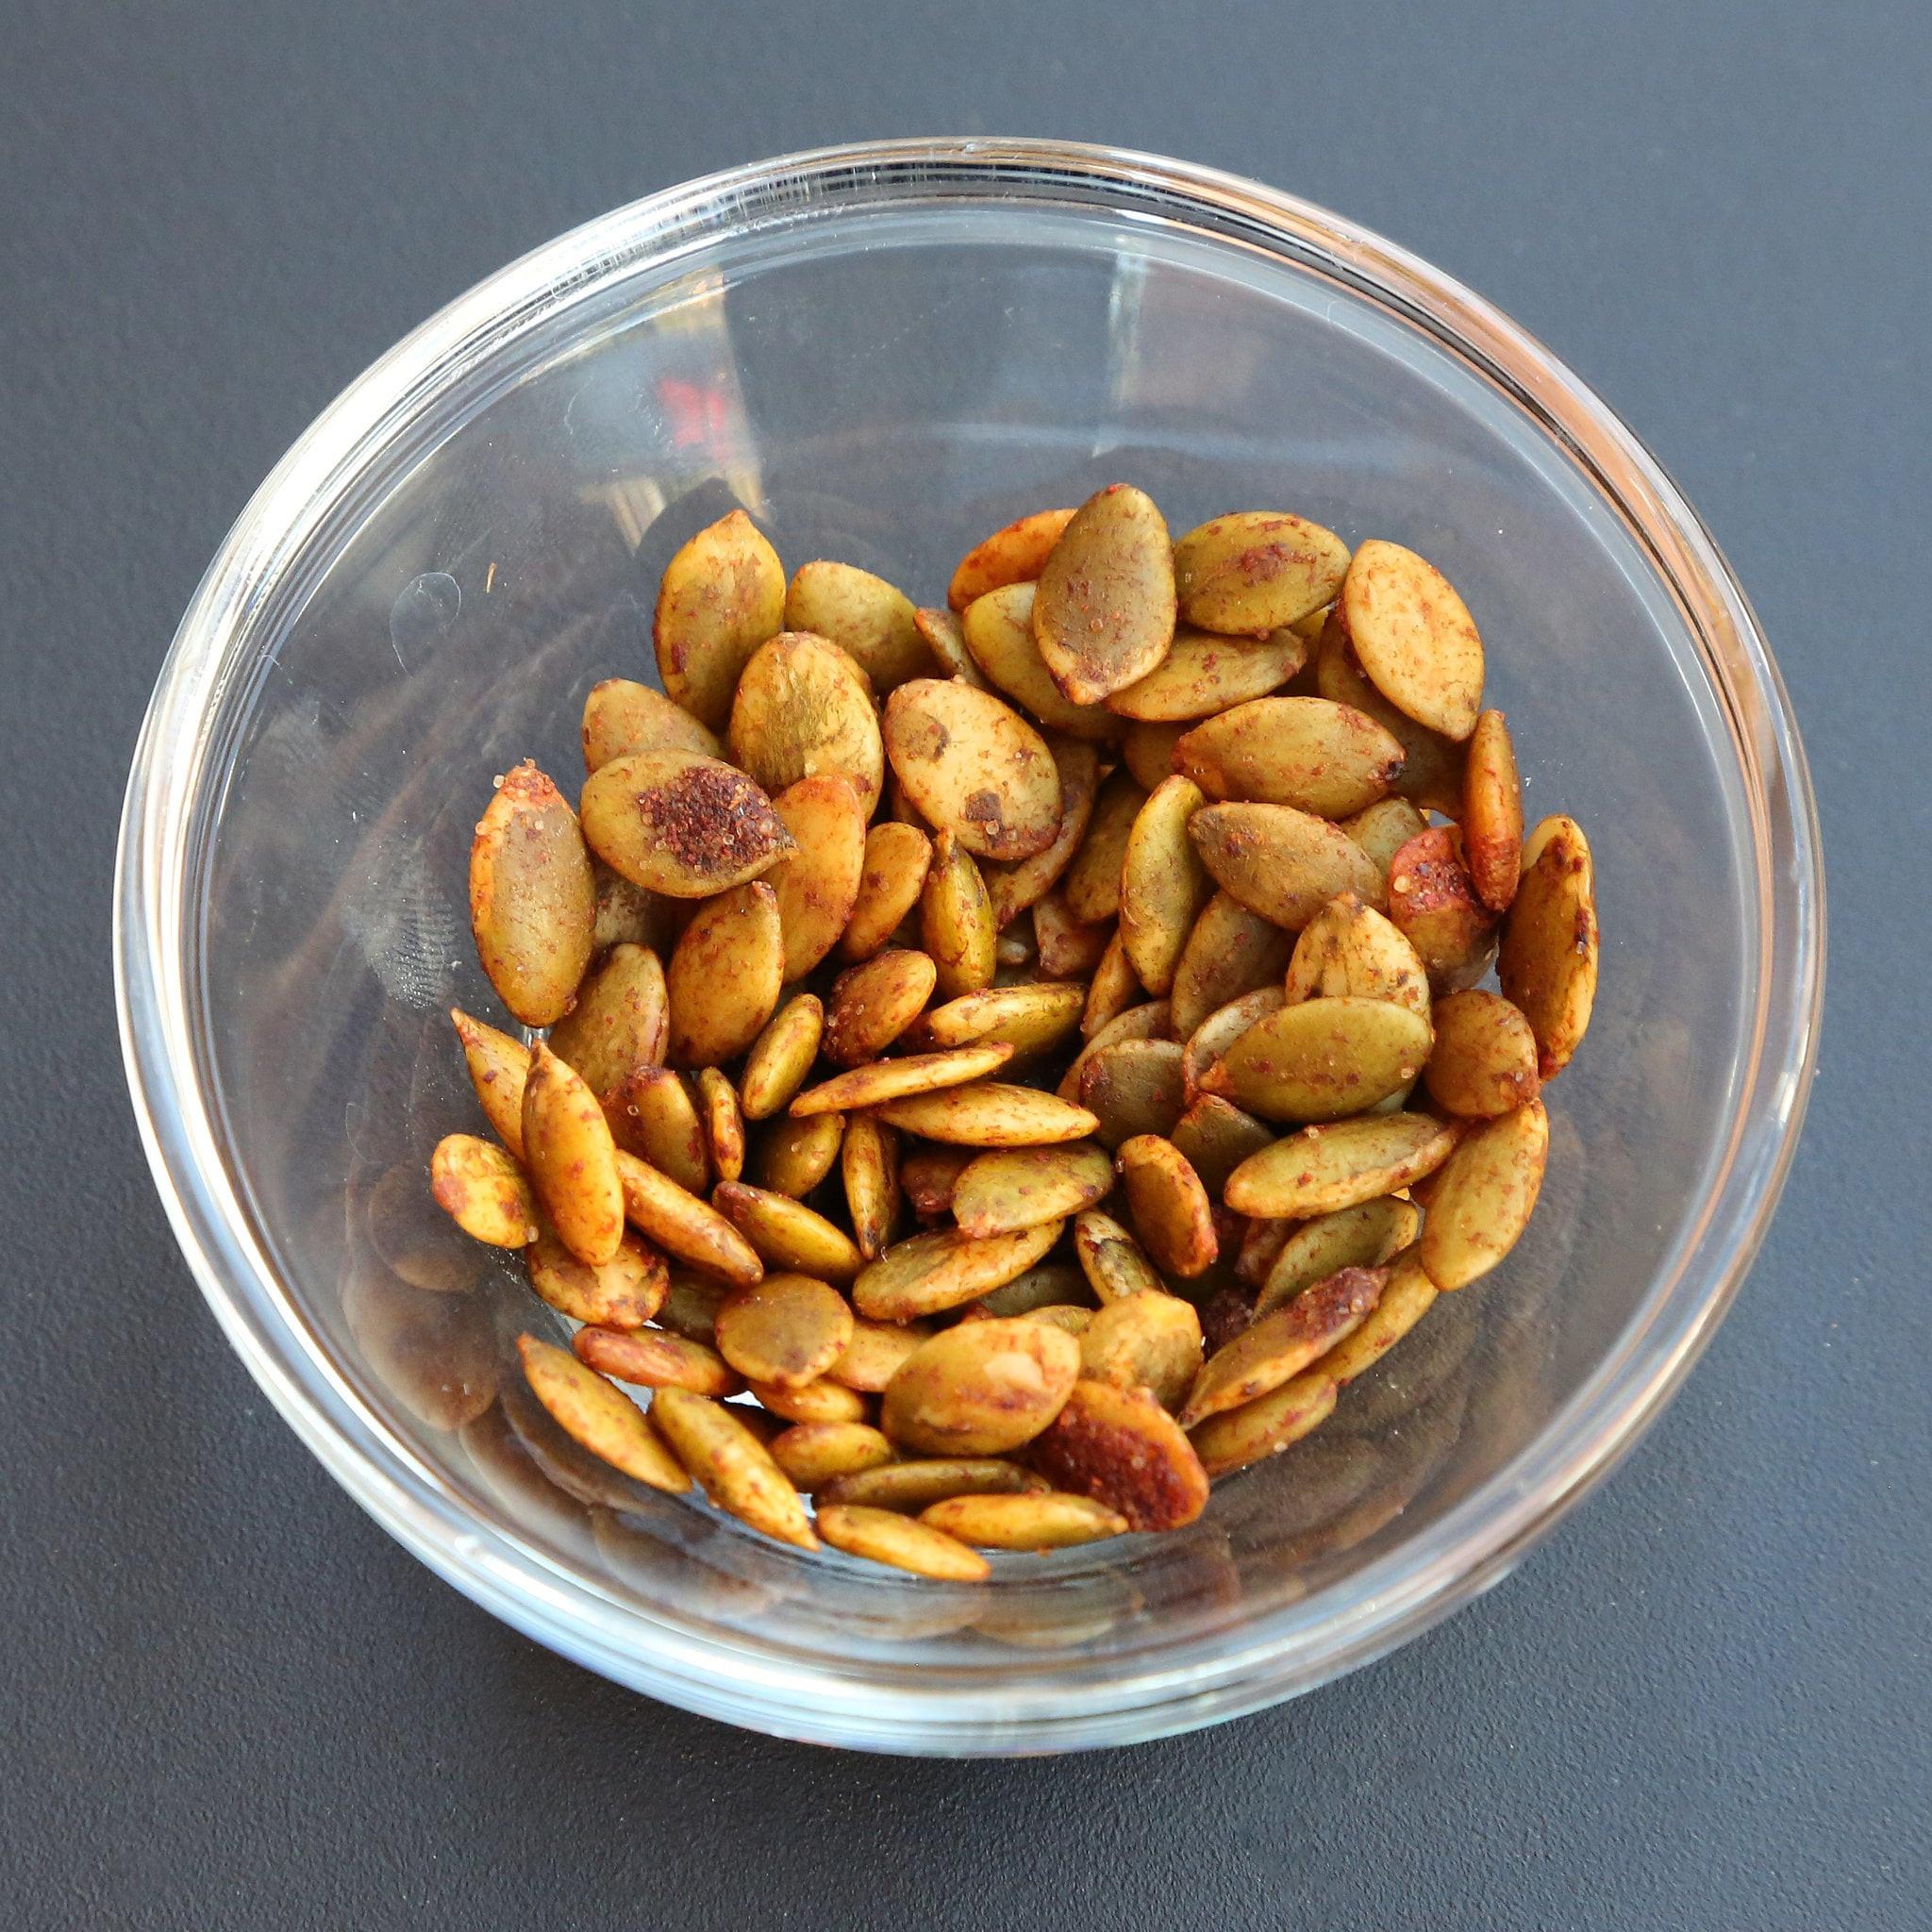 Pumpkin Seeds Healthy  Pumpkin Seed Health Benefits